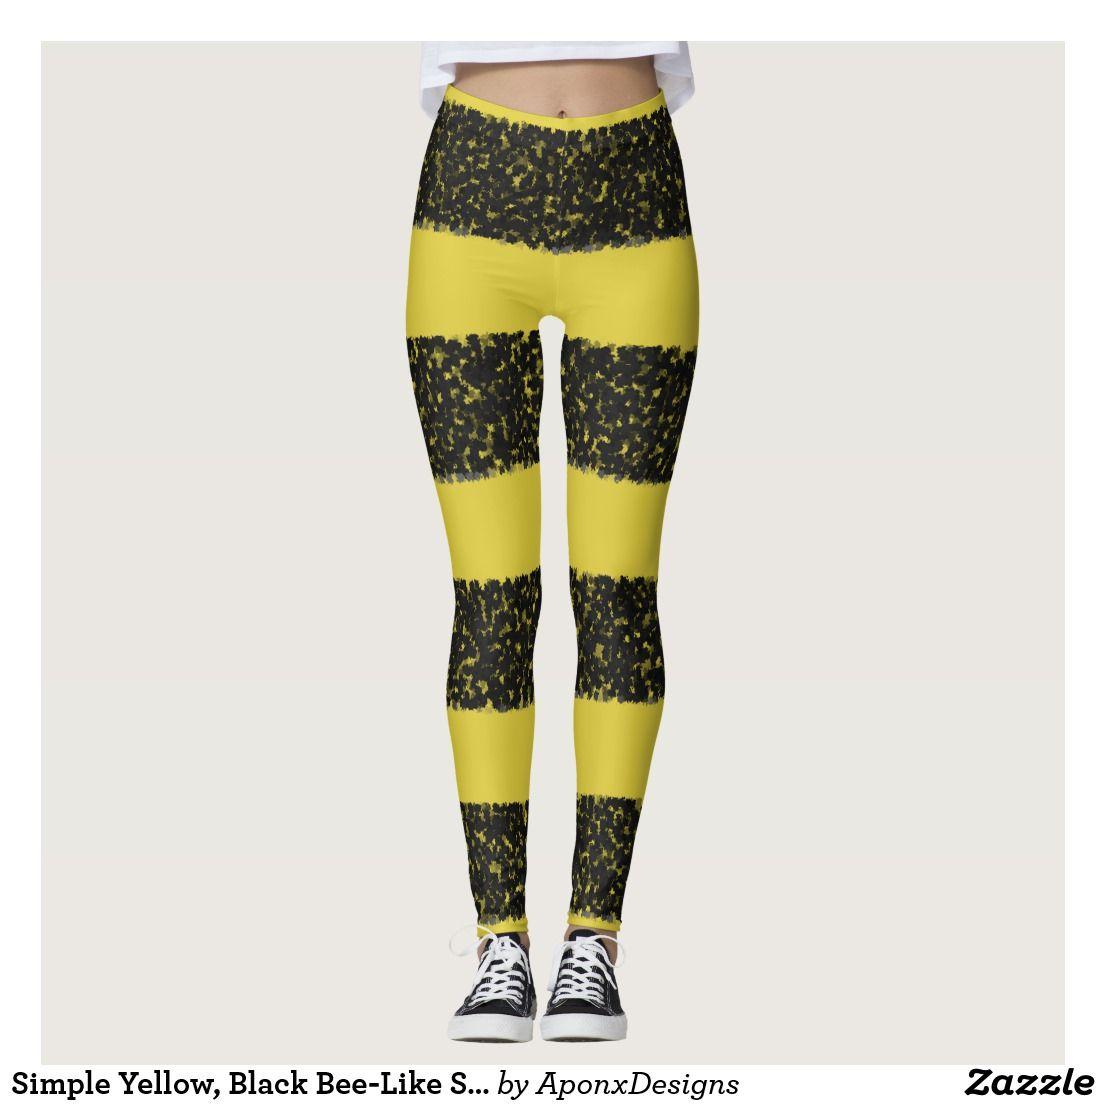 Simple Yellow, Black Bee-Like Stripes Leggings | Zazzle.com #stripedleggings